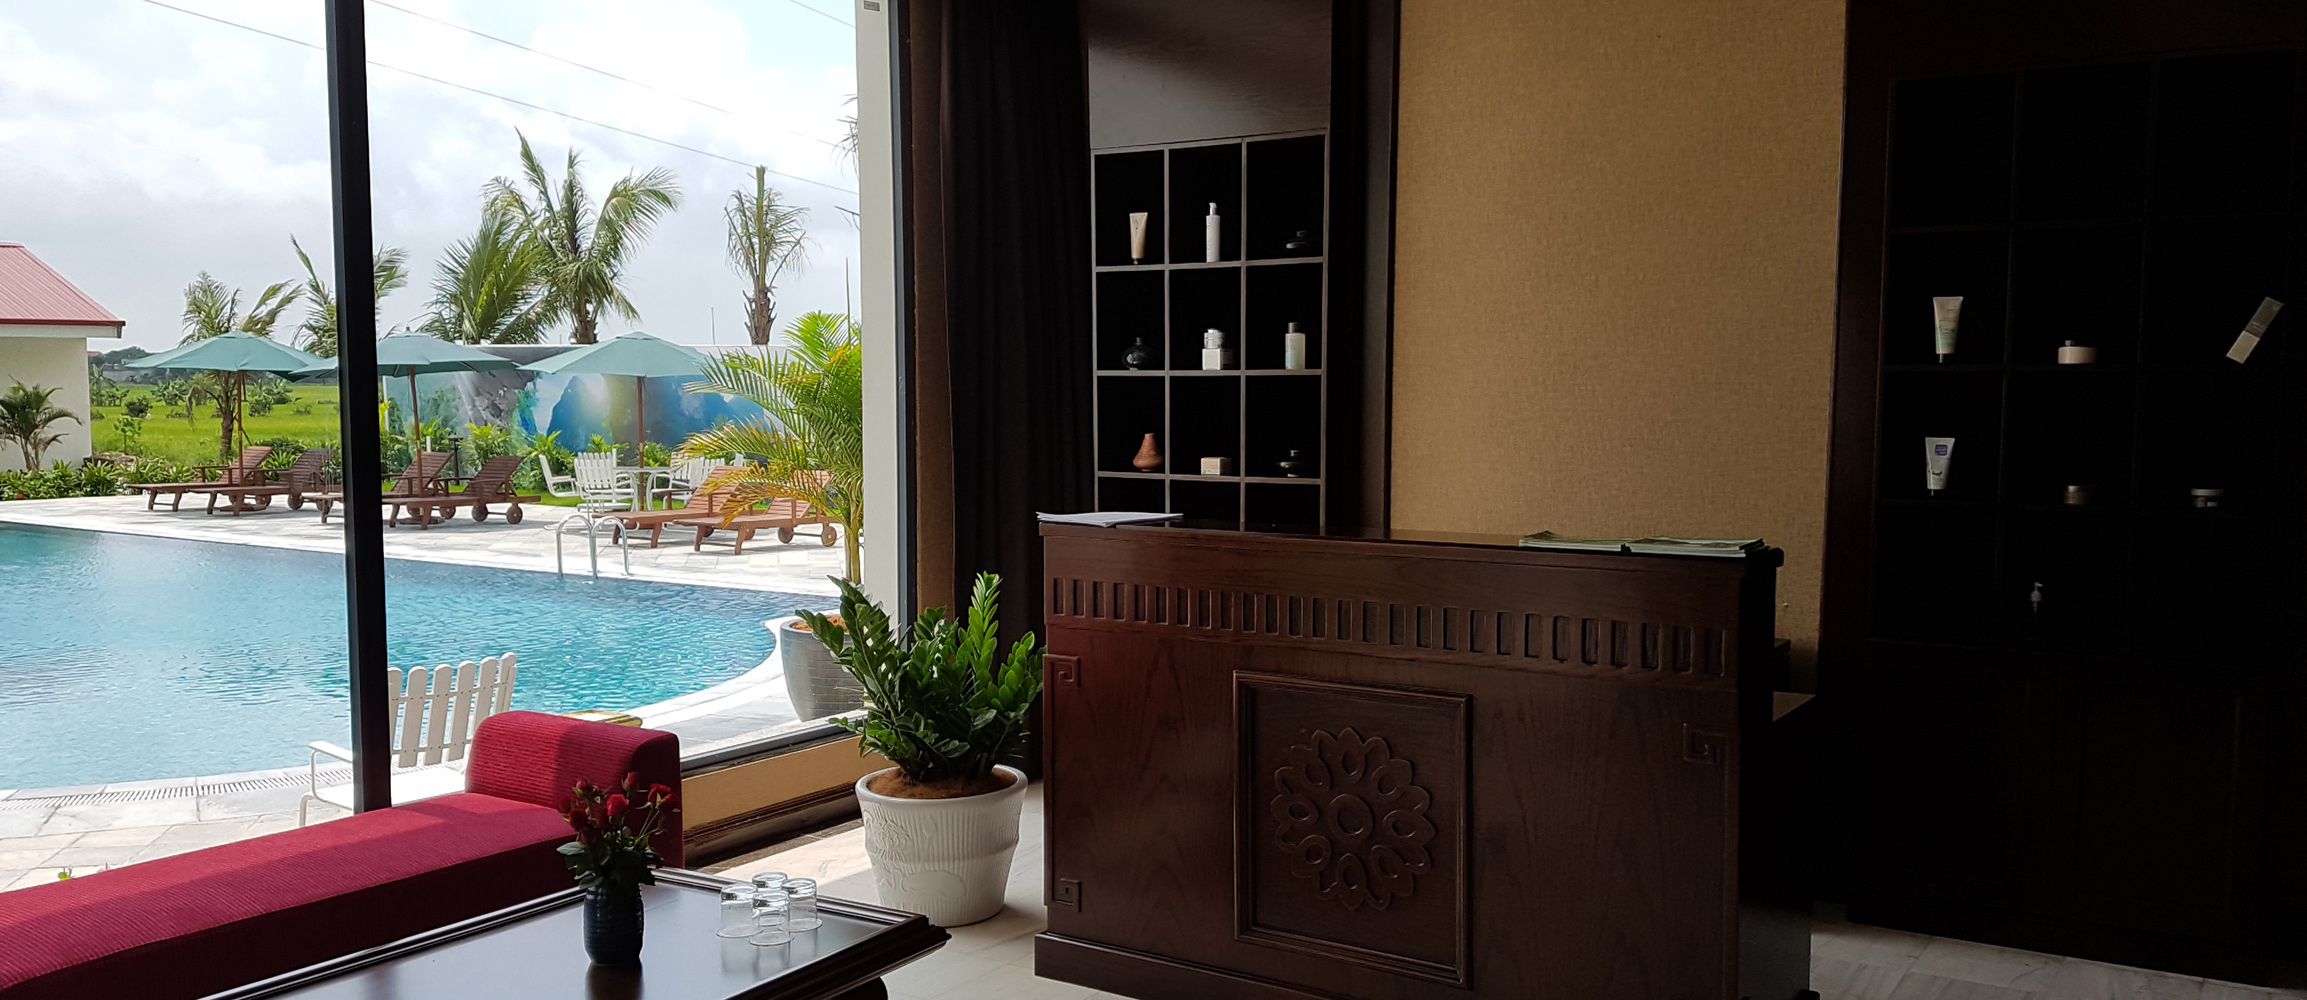 Hidden Charm Hotel offers greta views